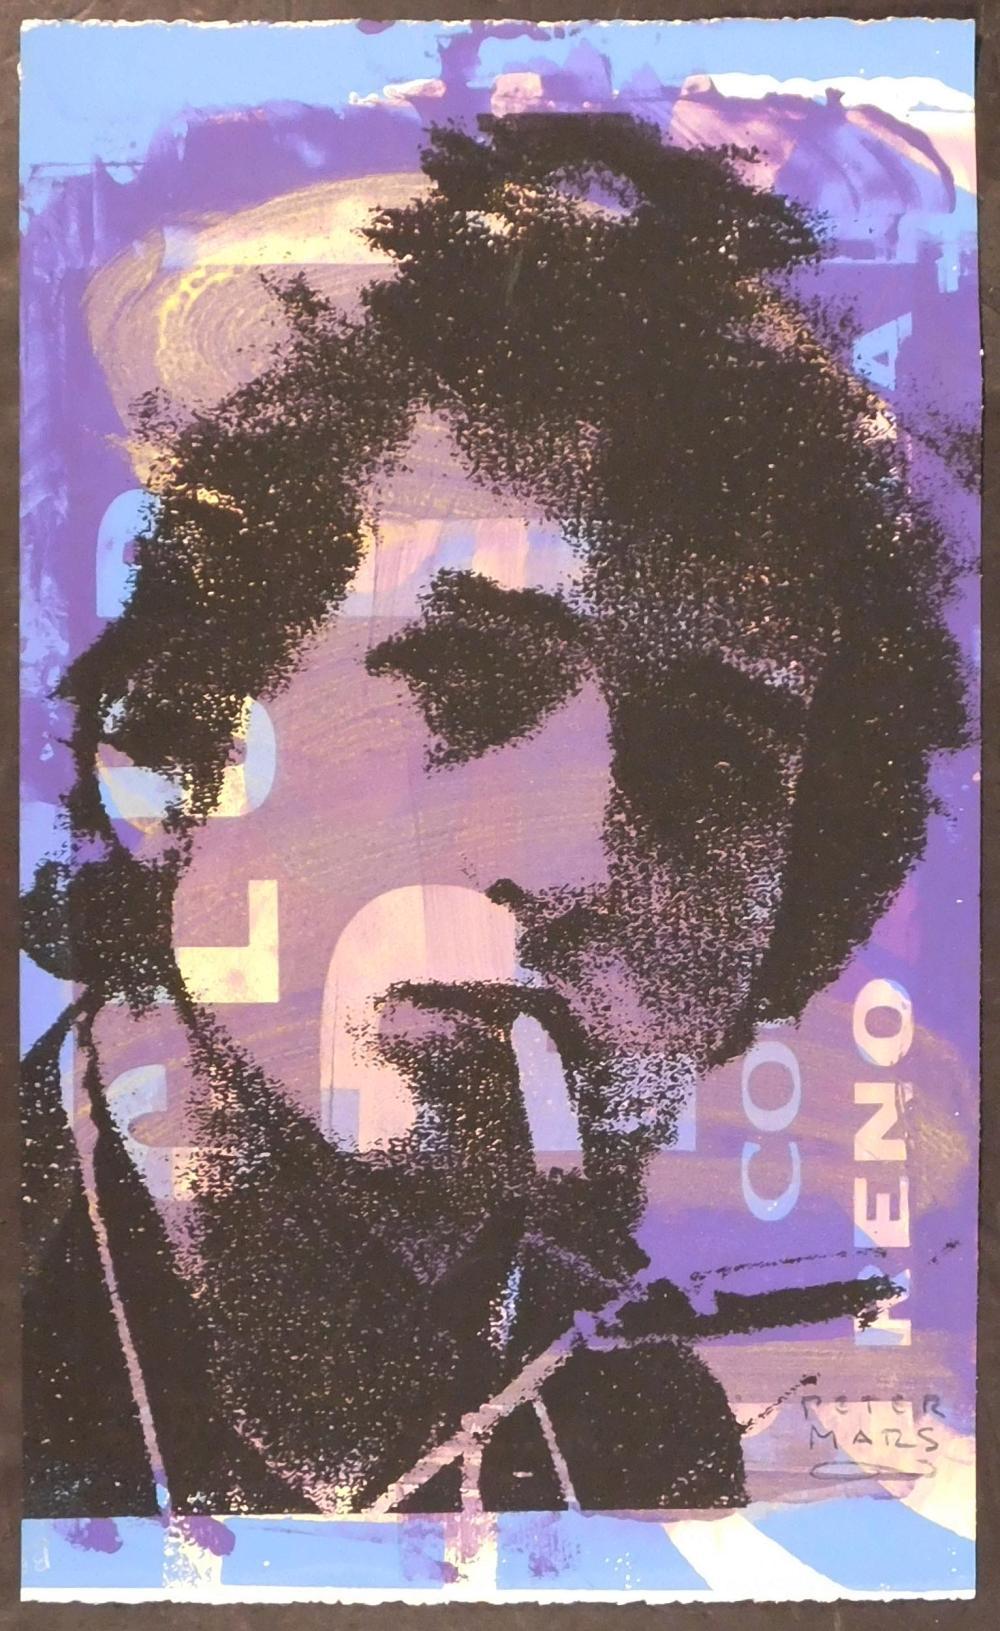 Peter Mars: Bob Dylan